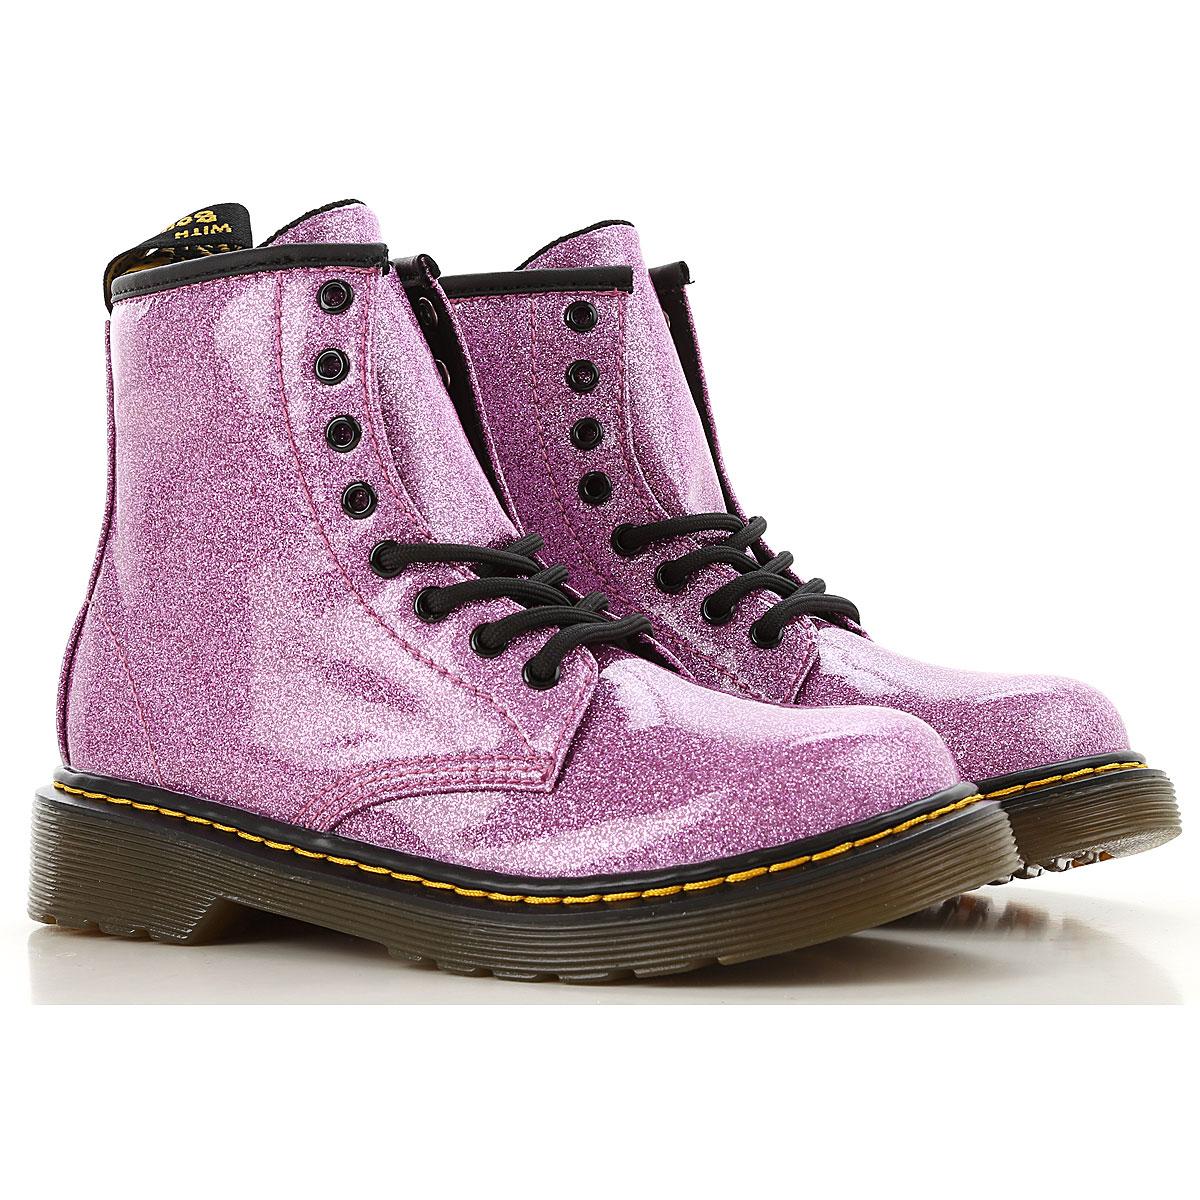 Image of Dr. Martens Boots, Dark Pink, polyamide, 2017, 28 29 30 31 32 33 34 35 36